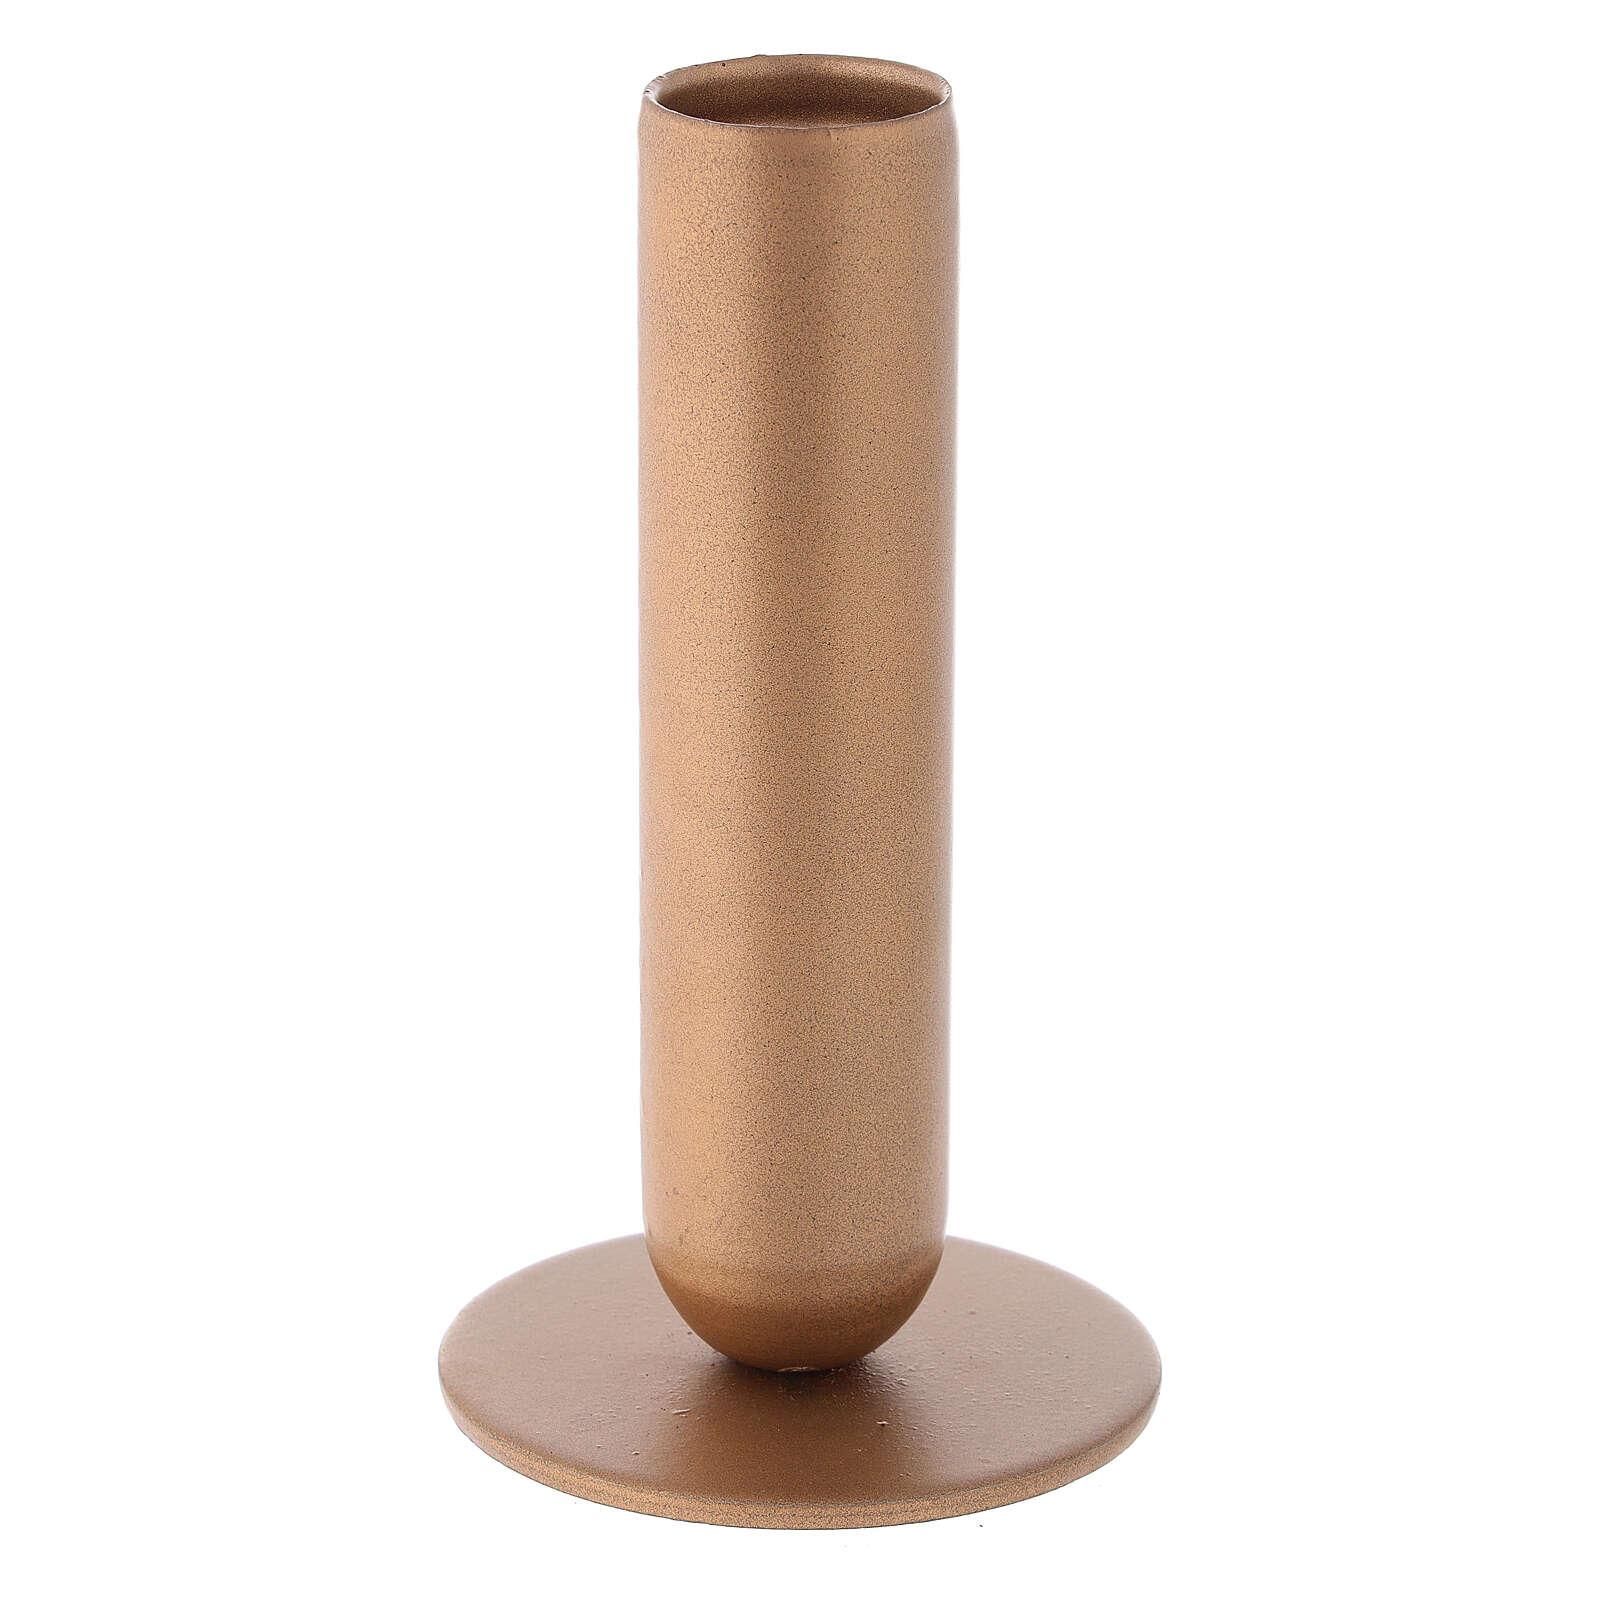 Bougeoir fer doré bocal haut h 12 cm 3